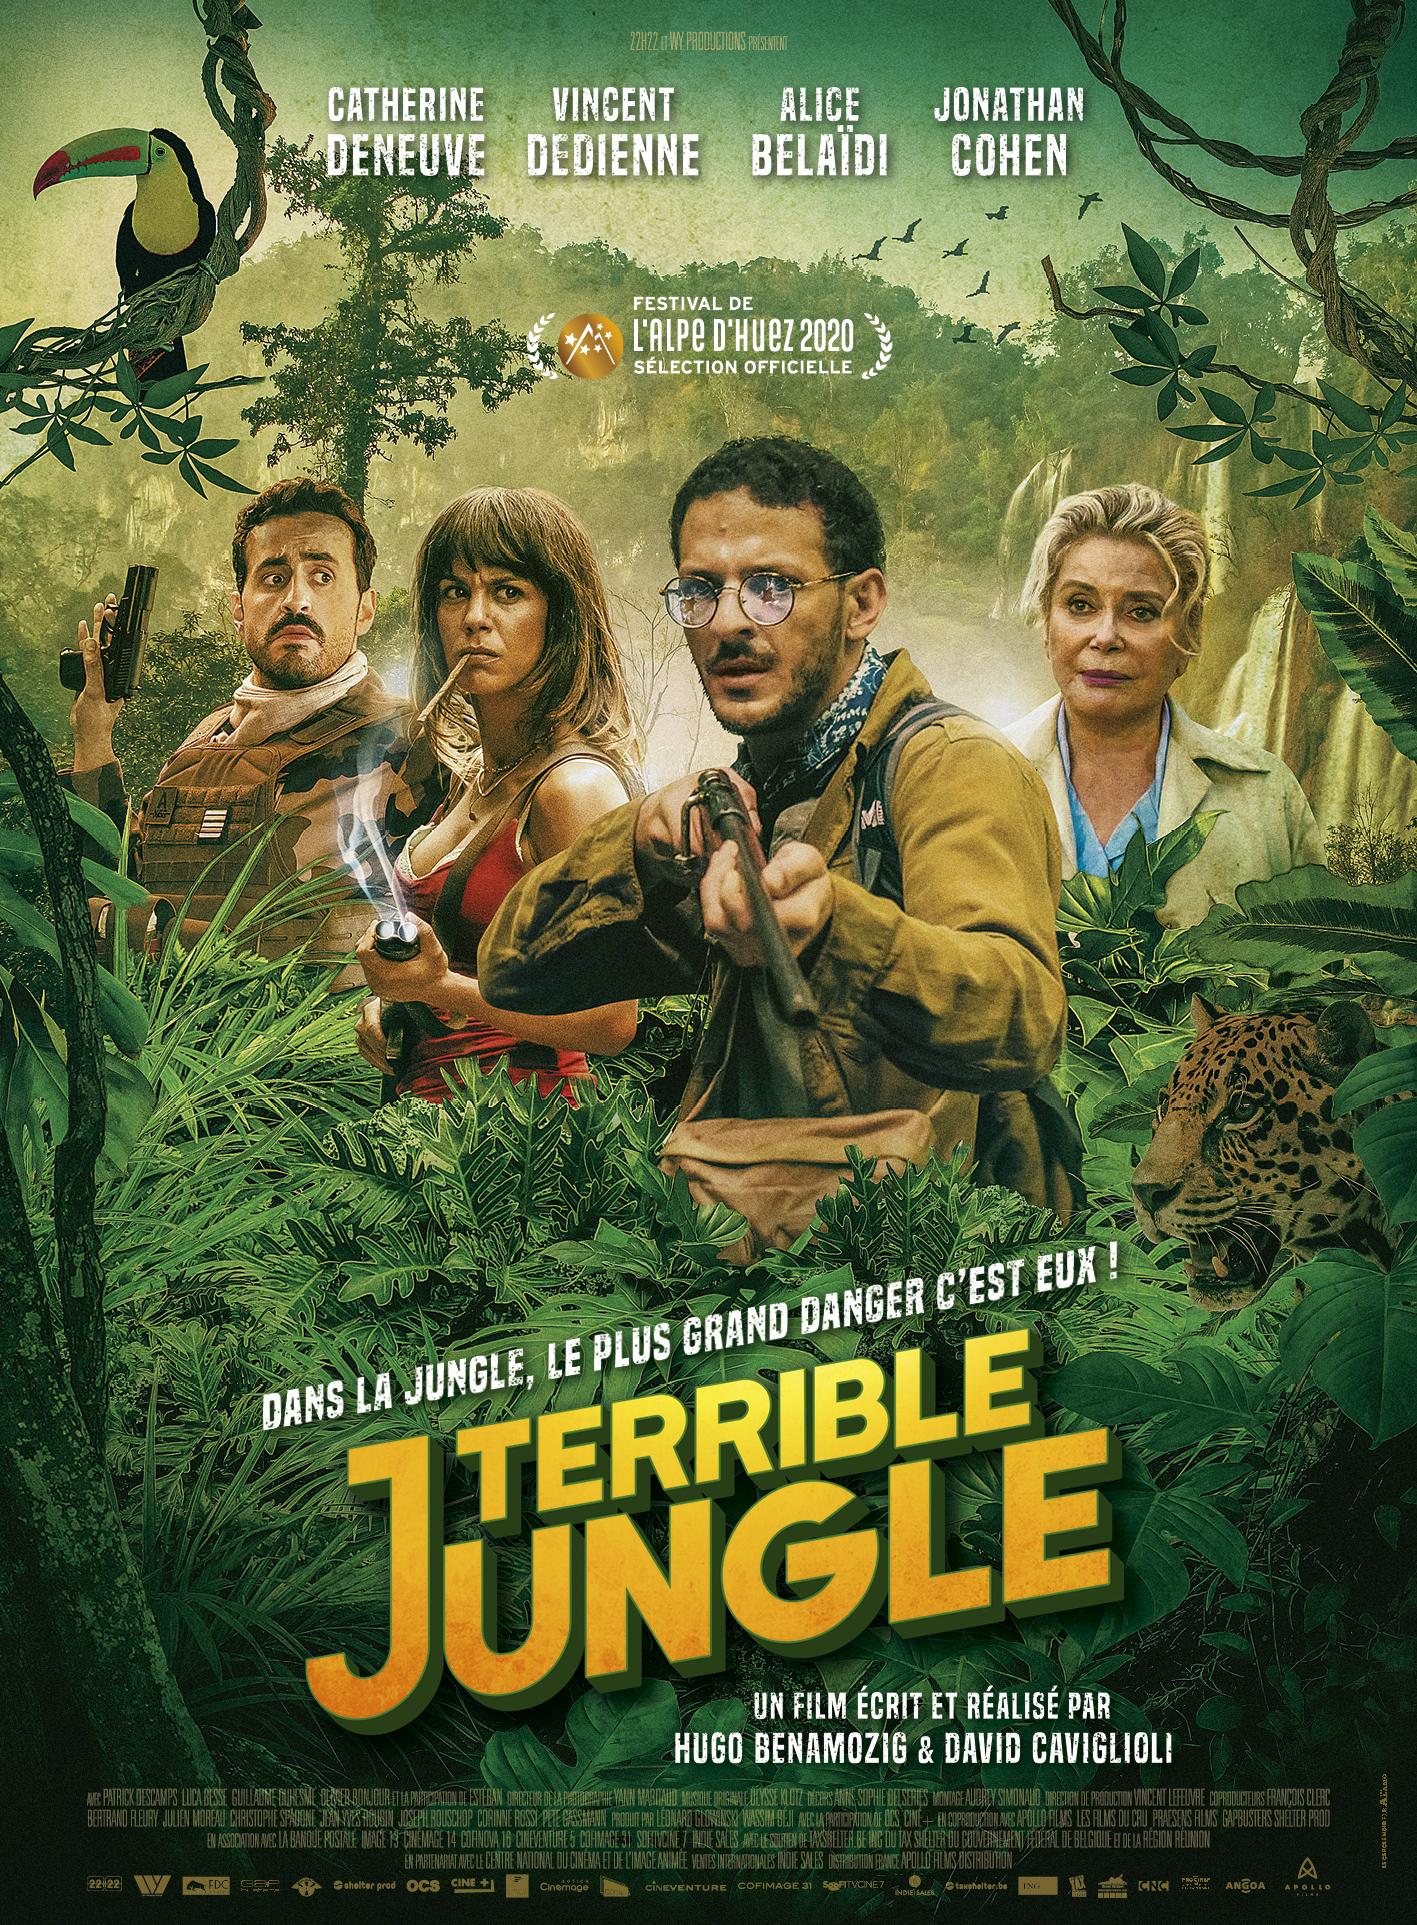 Terrible Jungle affiche film 2020